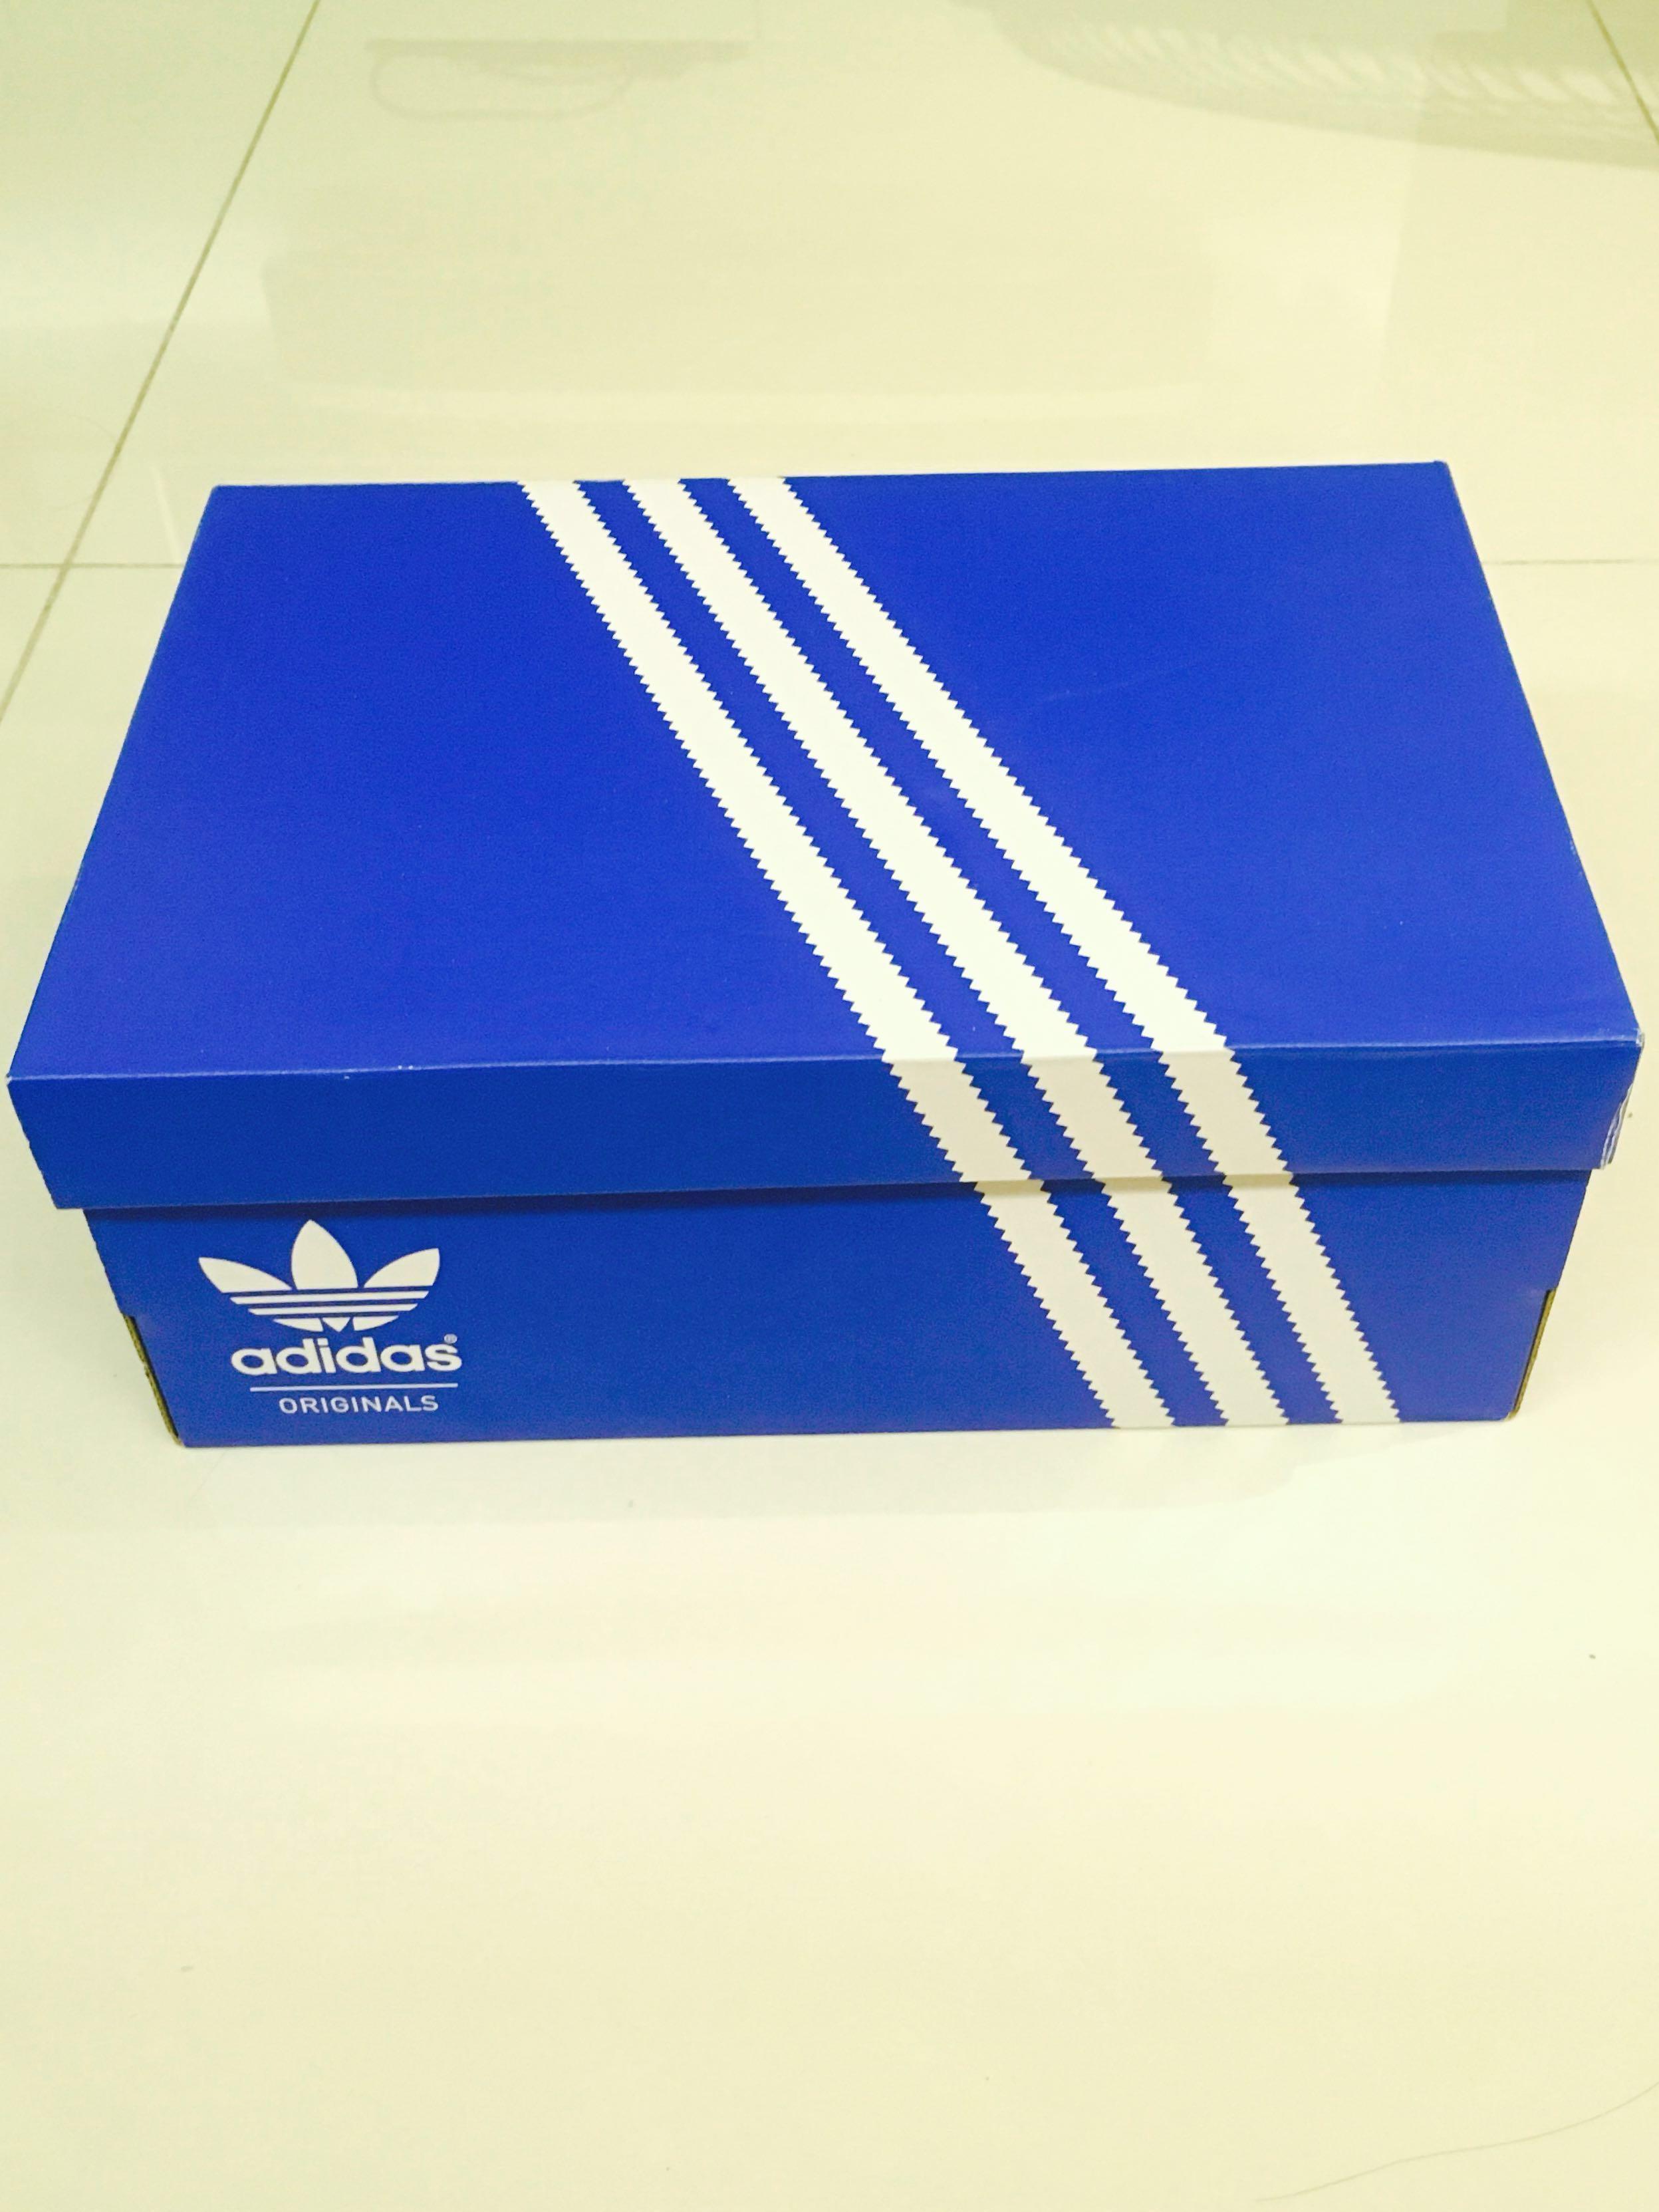 Adidas Originals Shoe Box Everything Else On Carousell